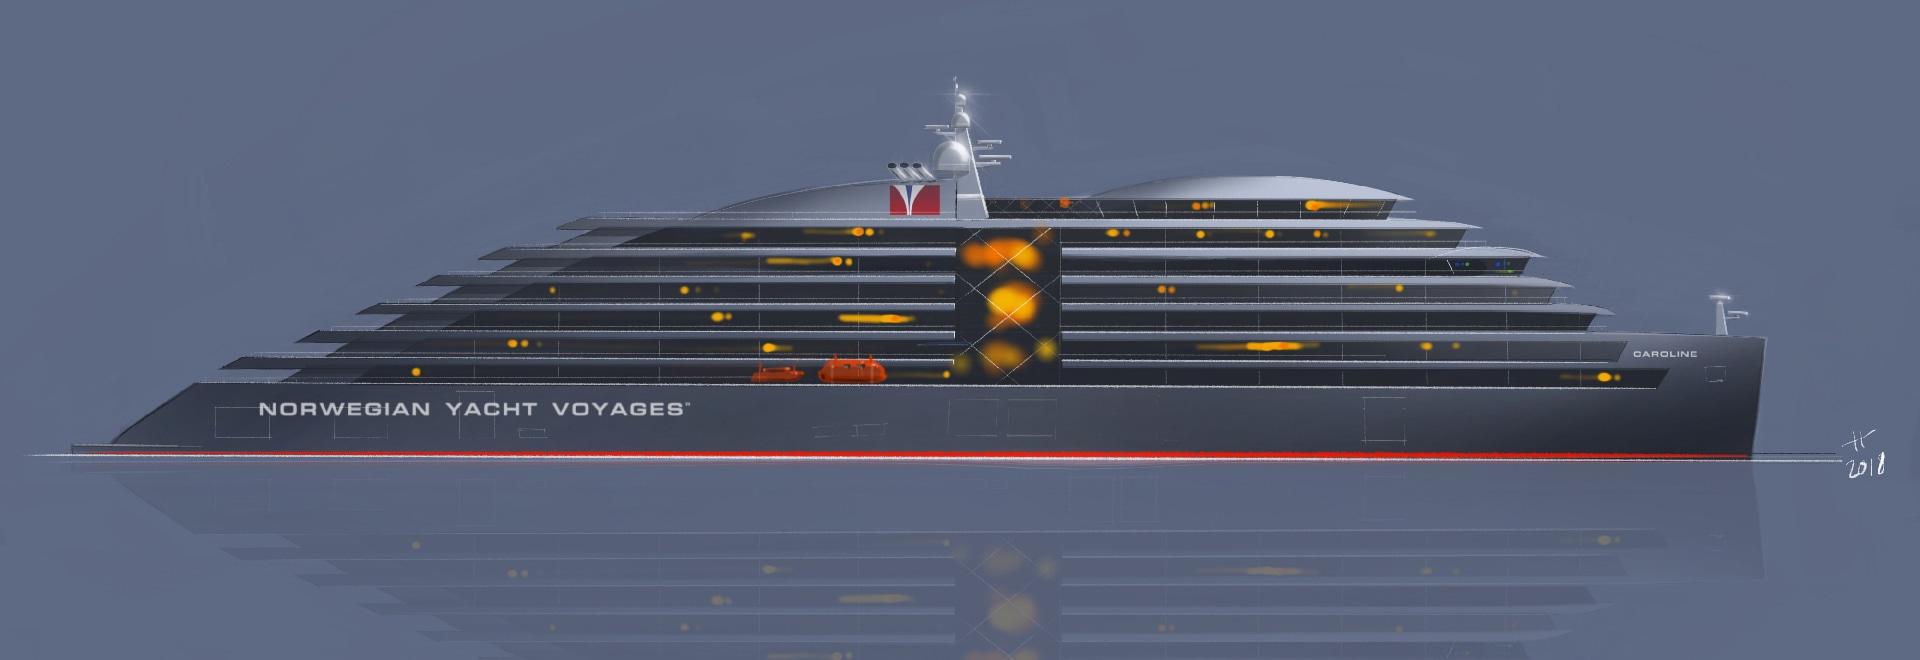 Norwegian Yacht Voyages